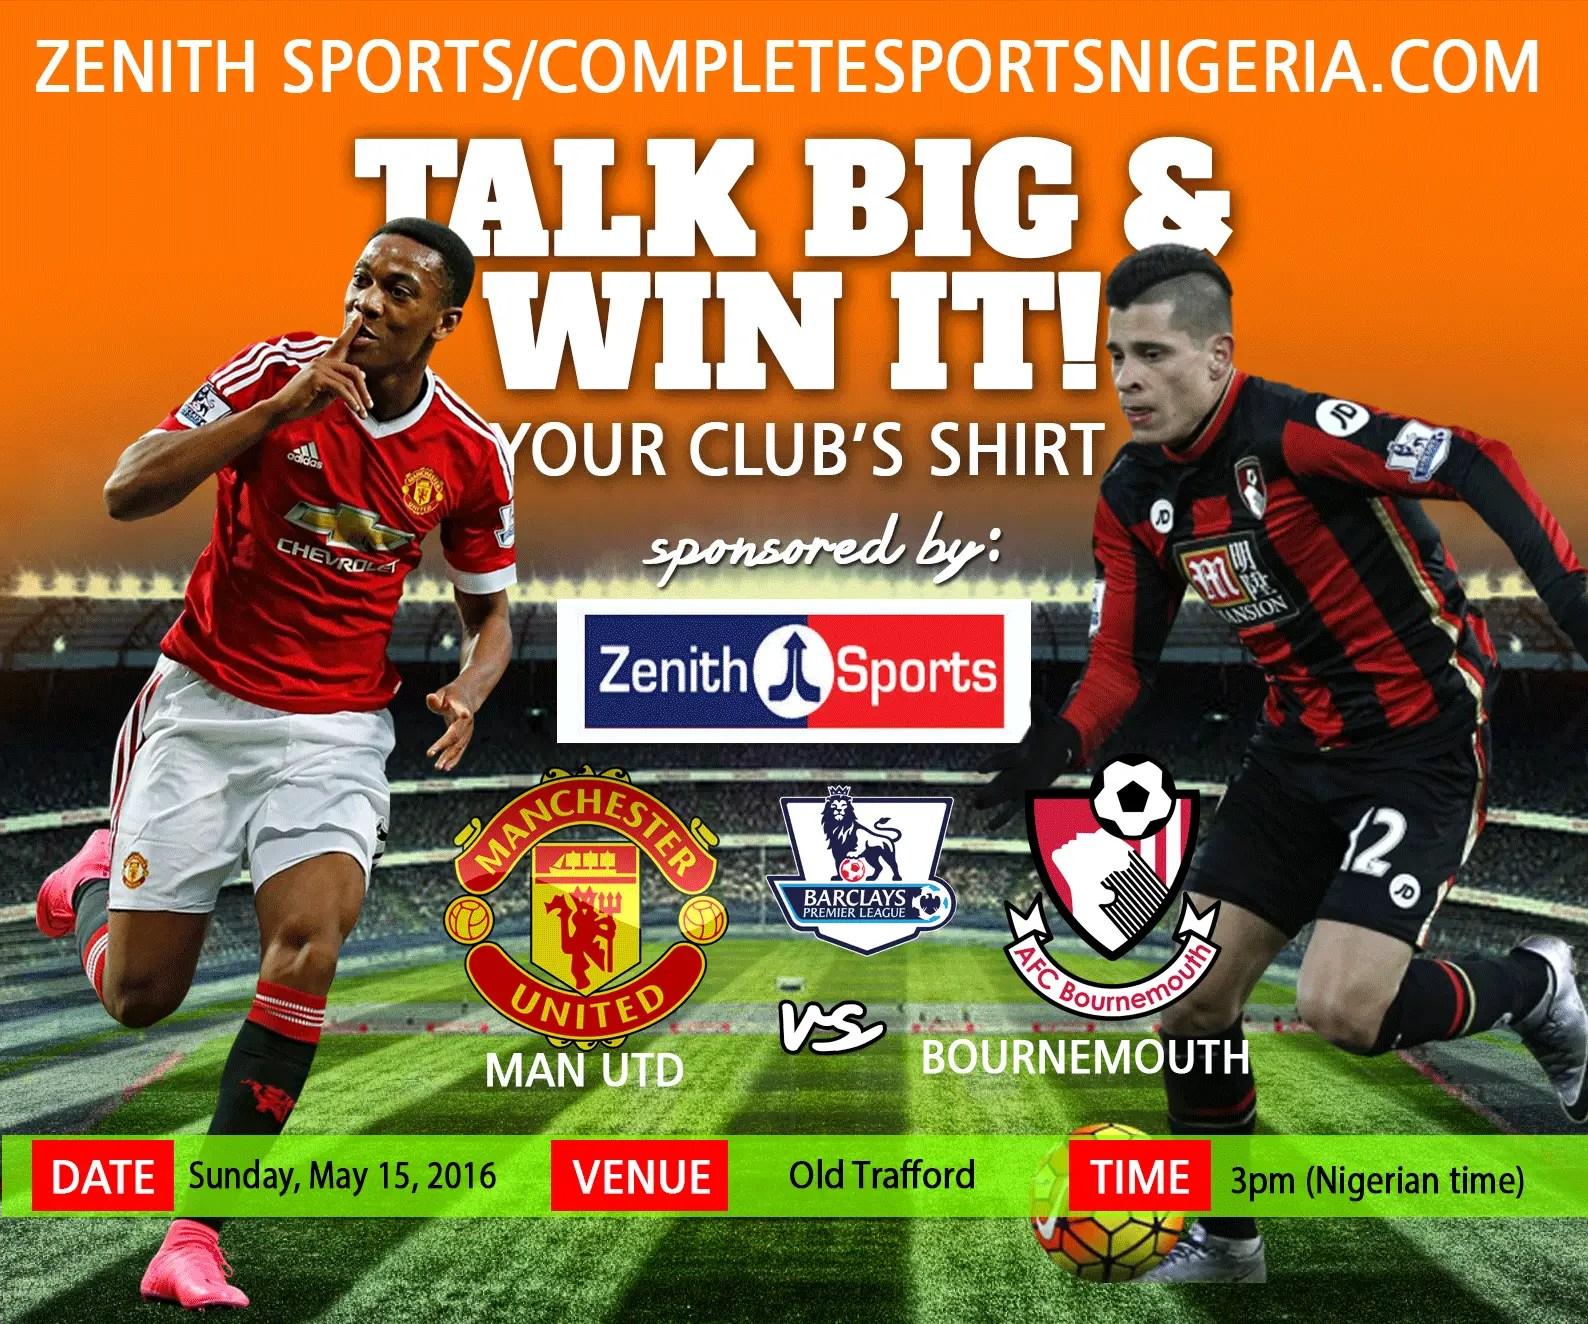 The Winners: Manchester United Vs Bournemouth, Talk Big & Win It!